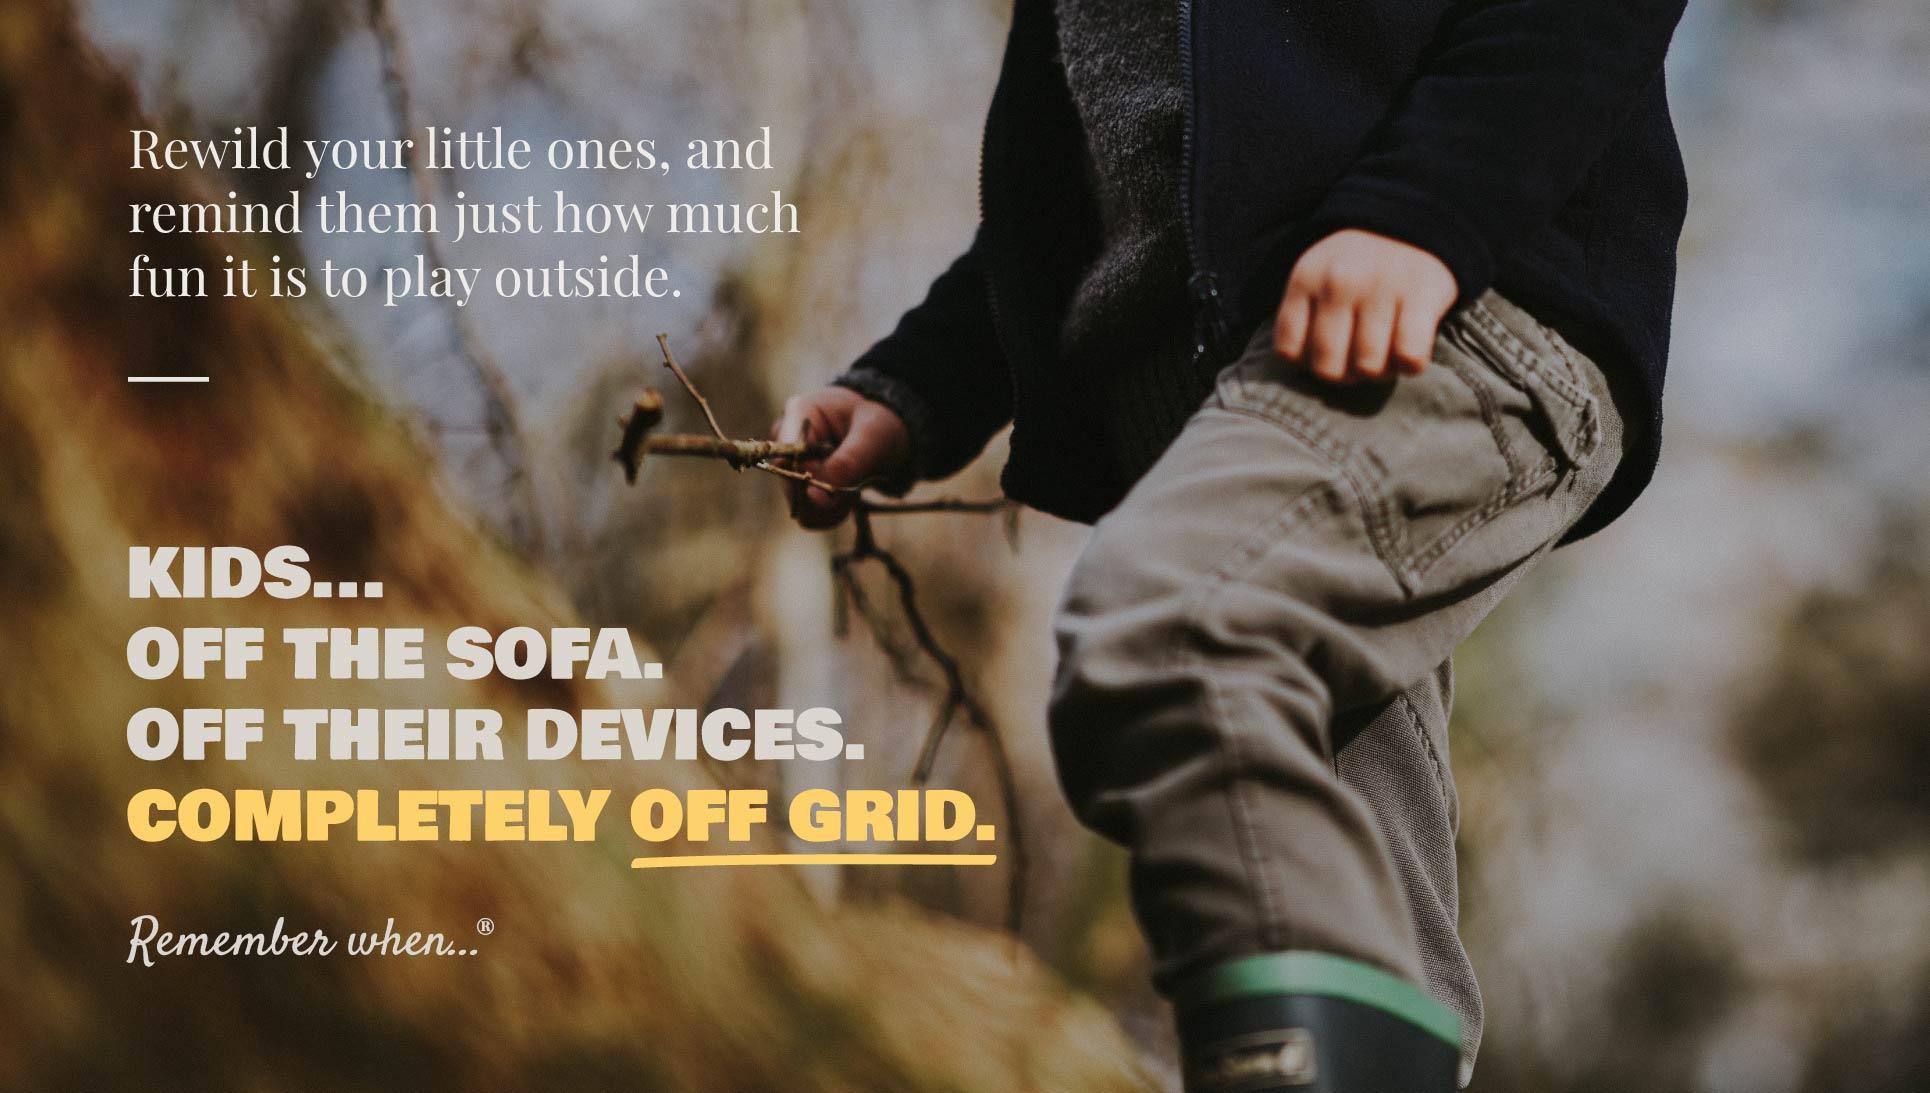 Kids Off Grid brand language communication graphic design image.